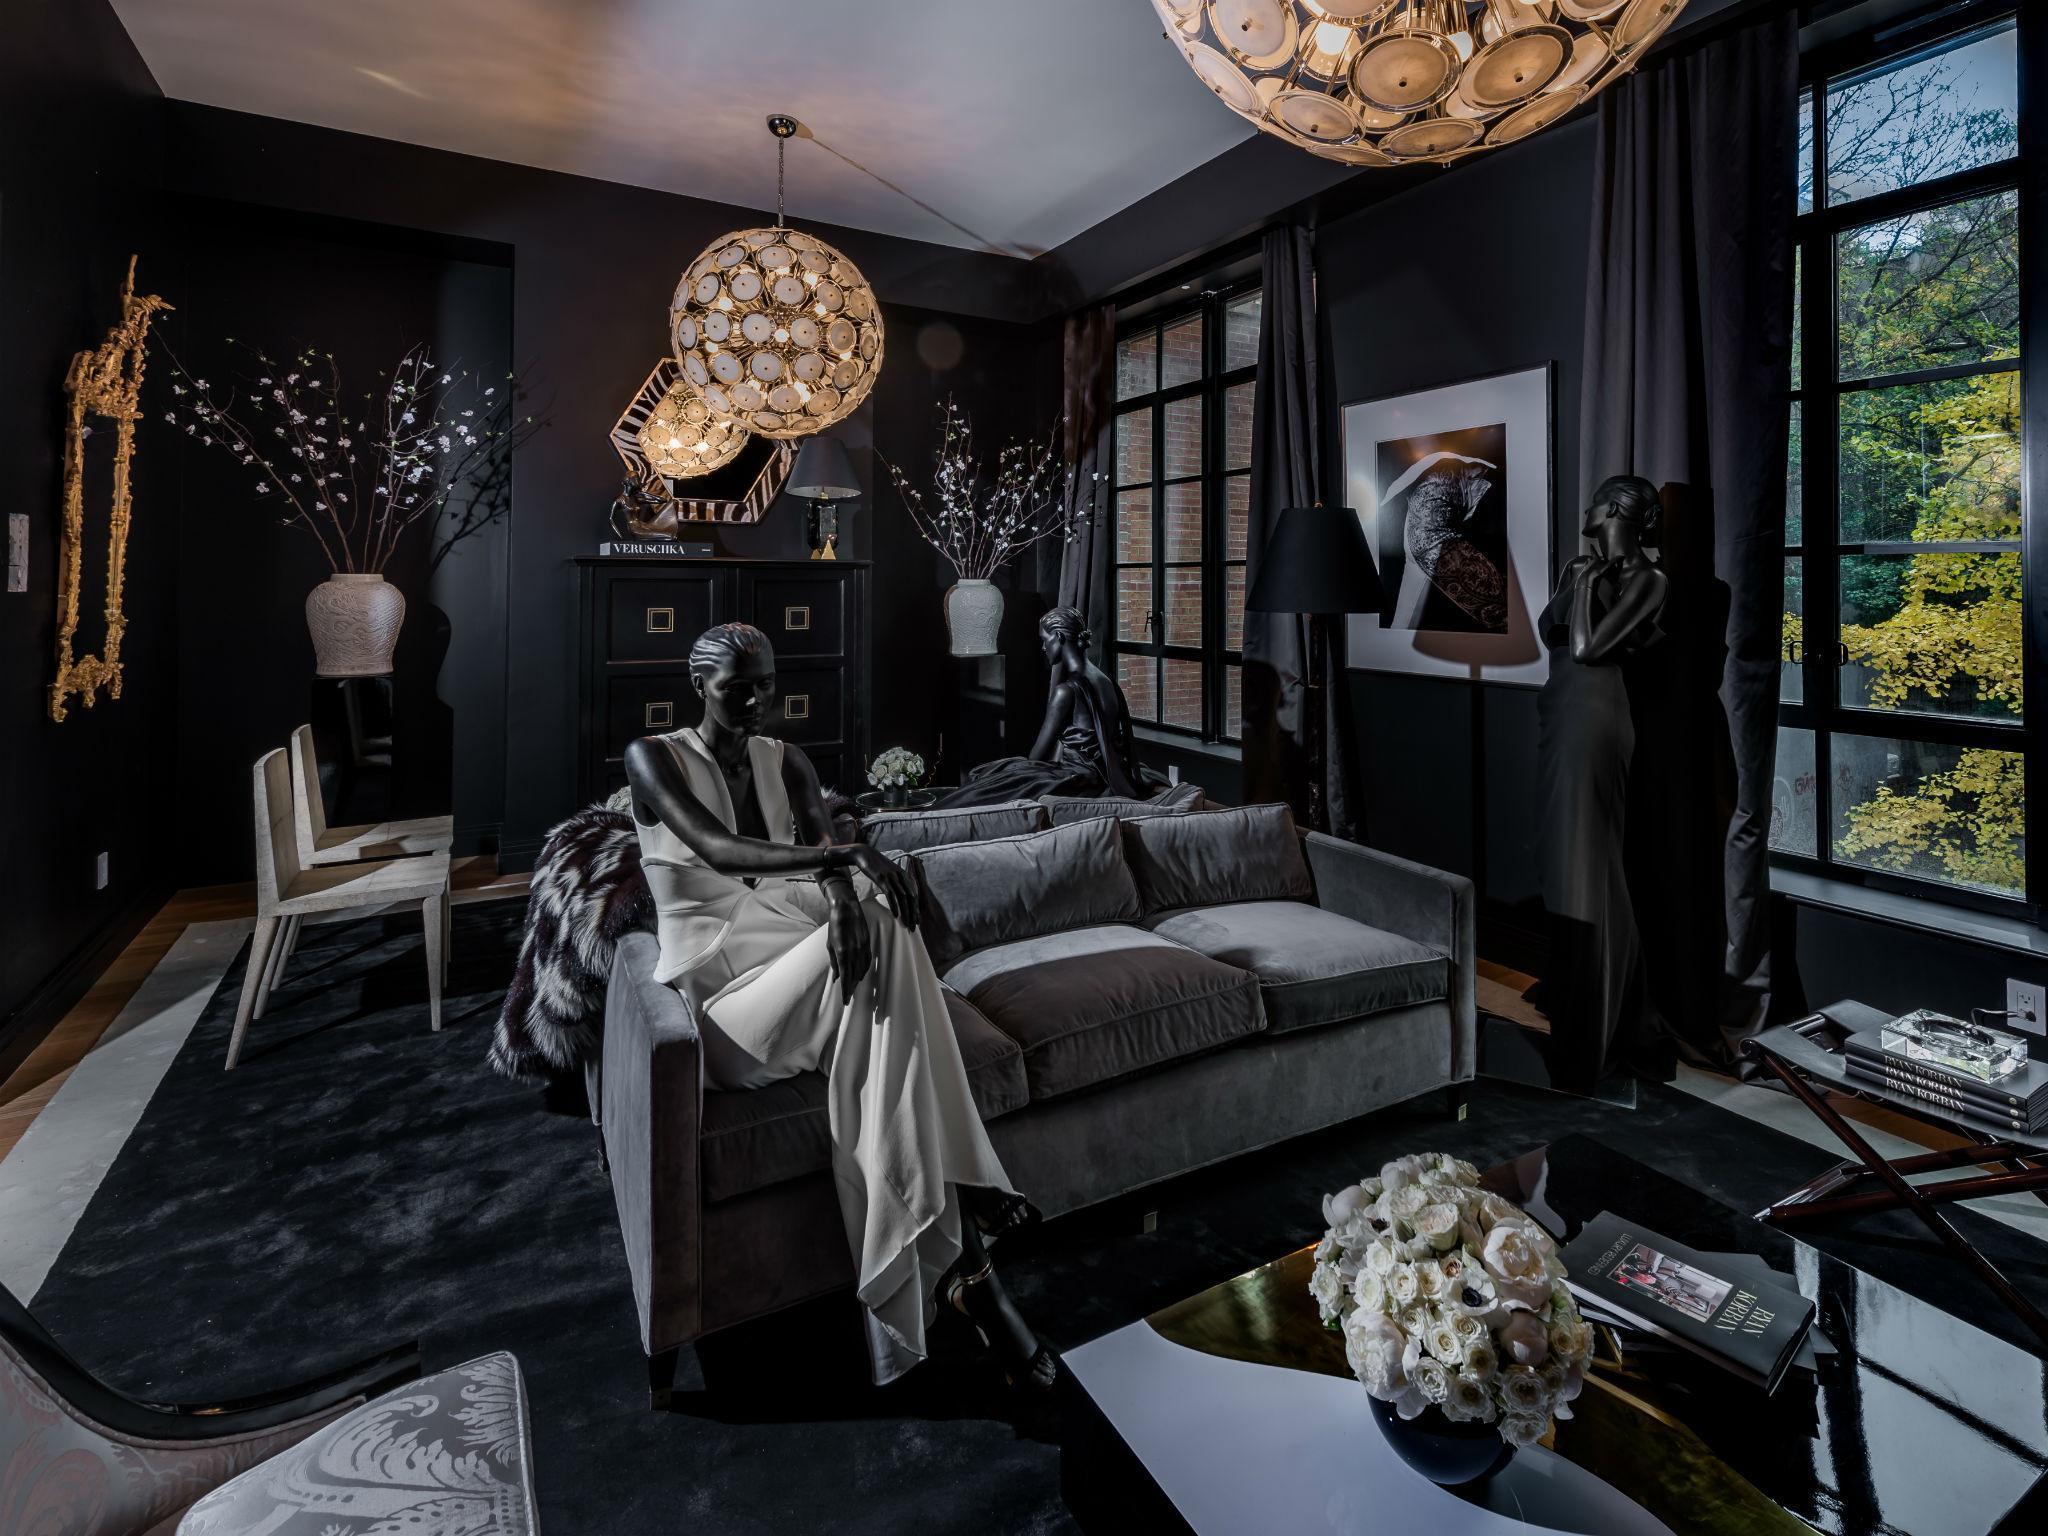 Taking A Tour Round Manhattan Town House That Costs 20 Million Inside Flats Joyce Pink Ryan Korbans Living Room Silvermans Themed Garden